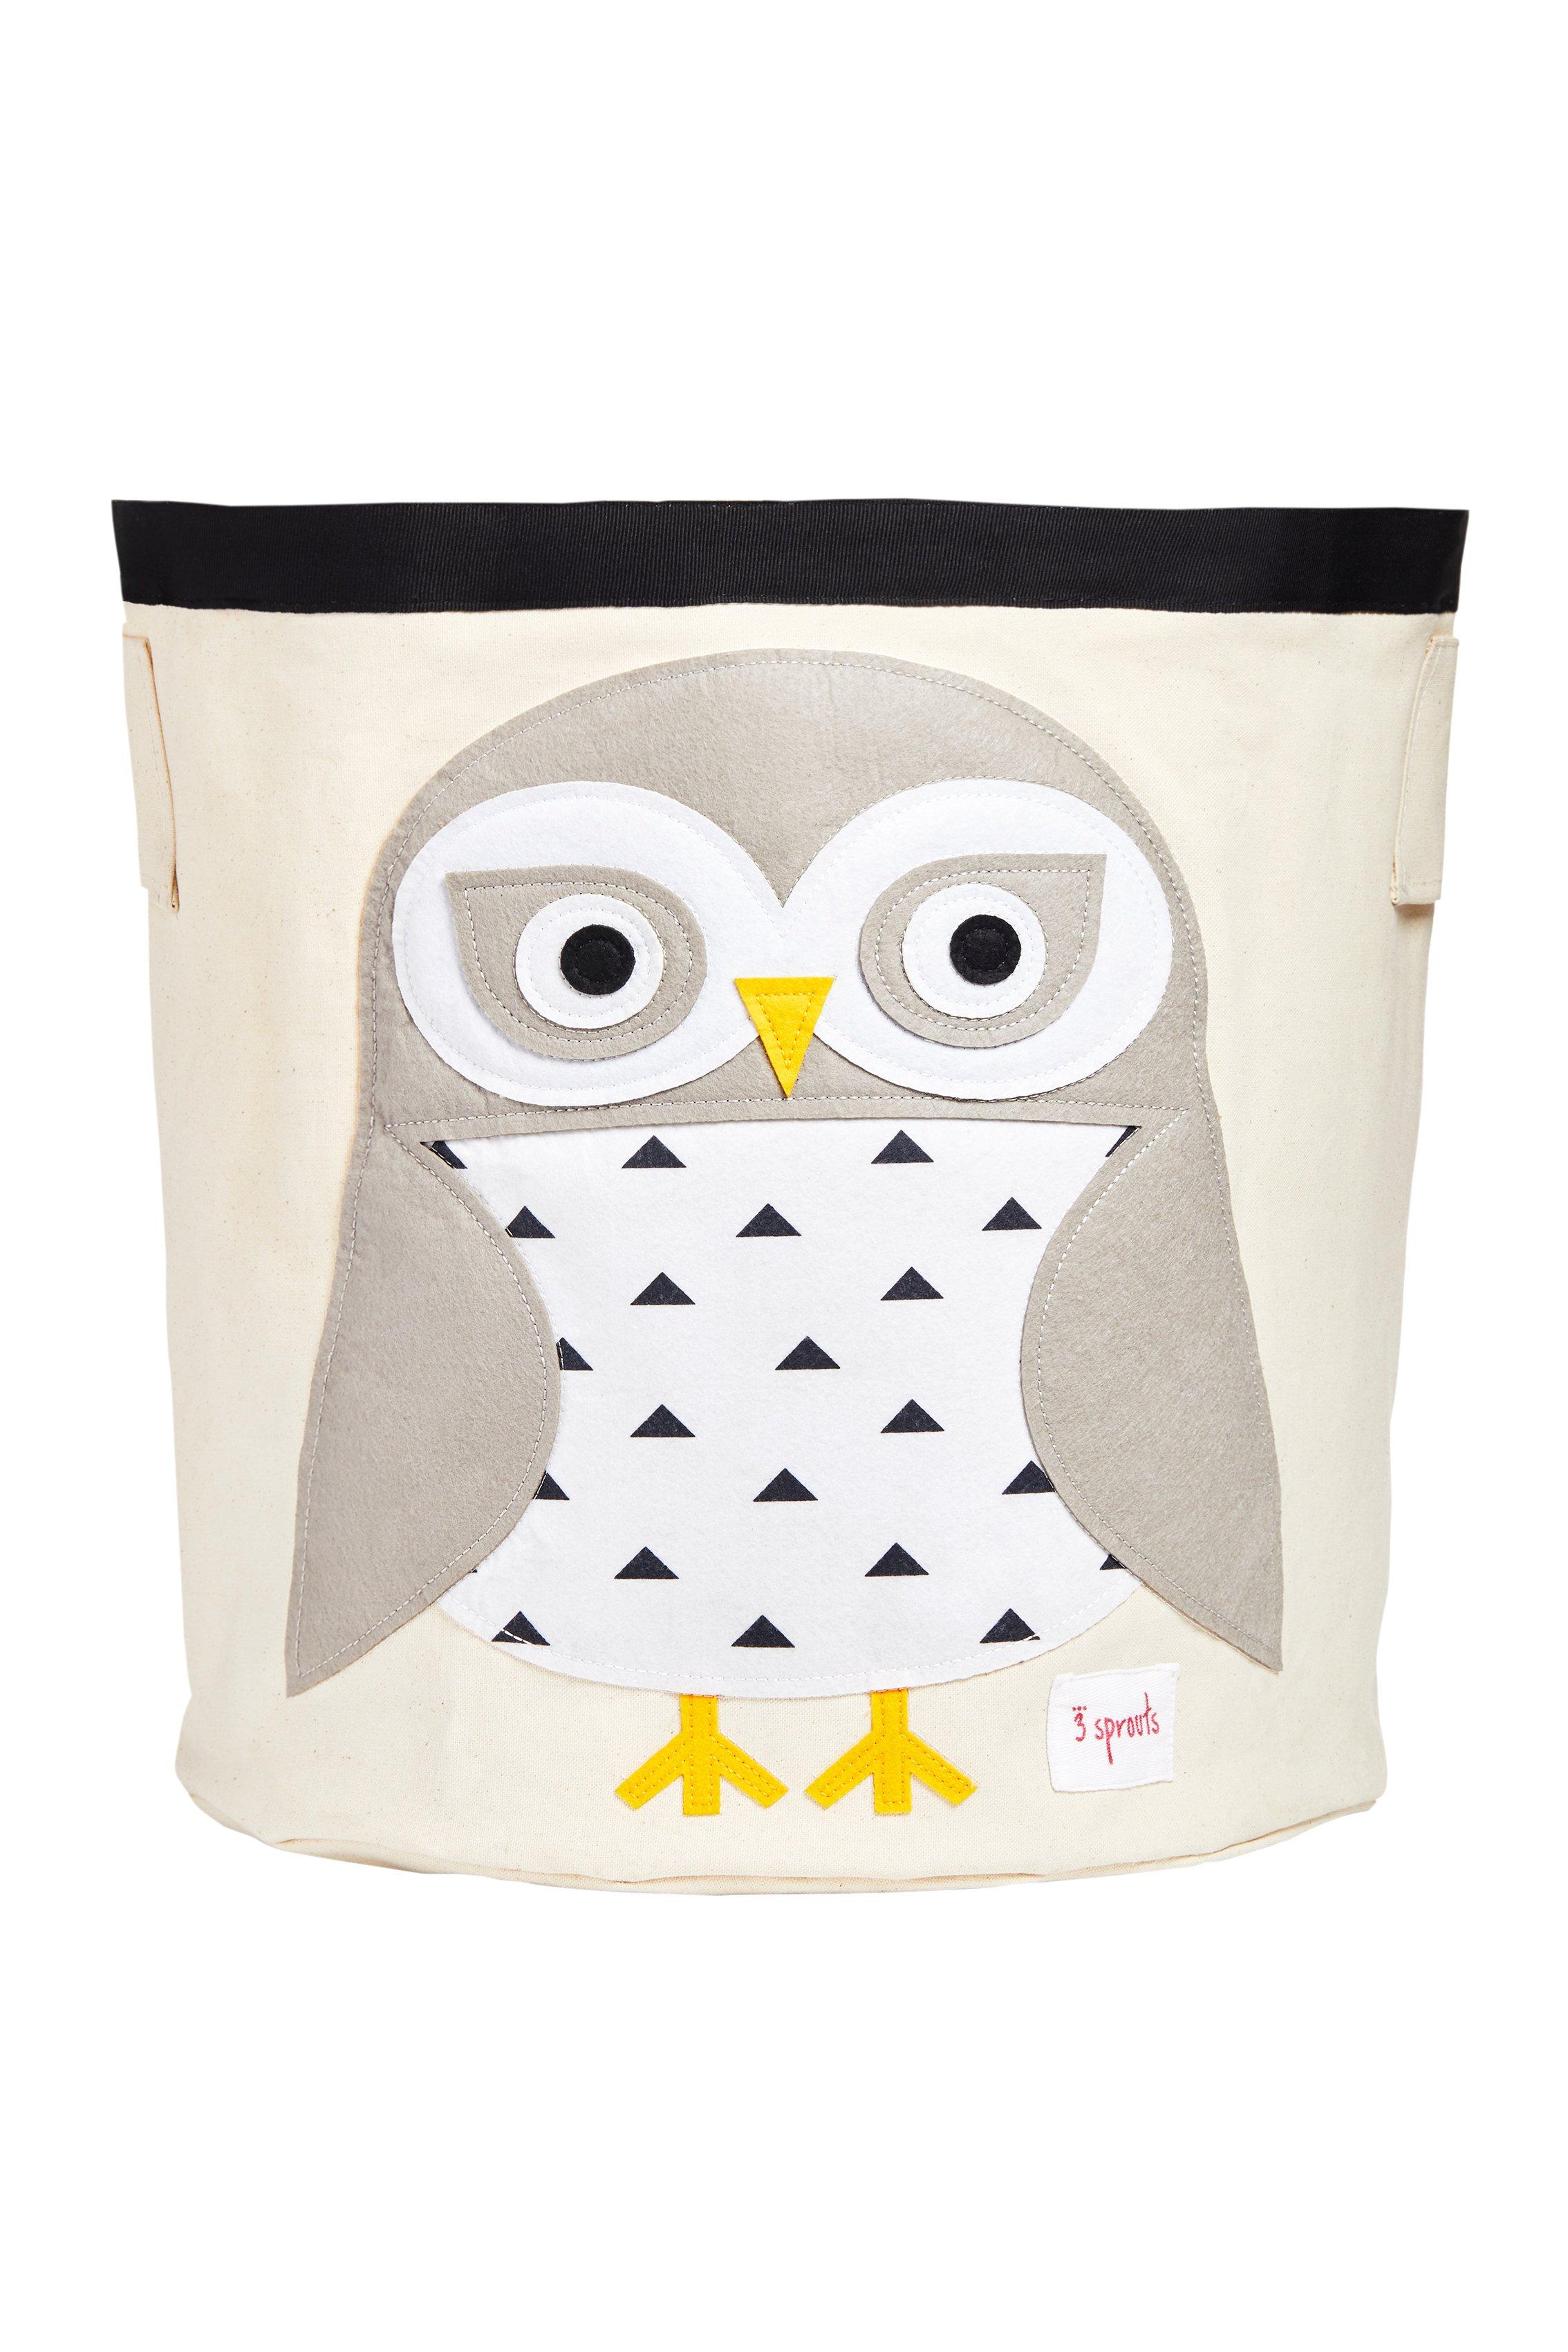 3 Sprouts - Storage Bin - White Snowy Owl